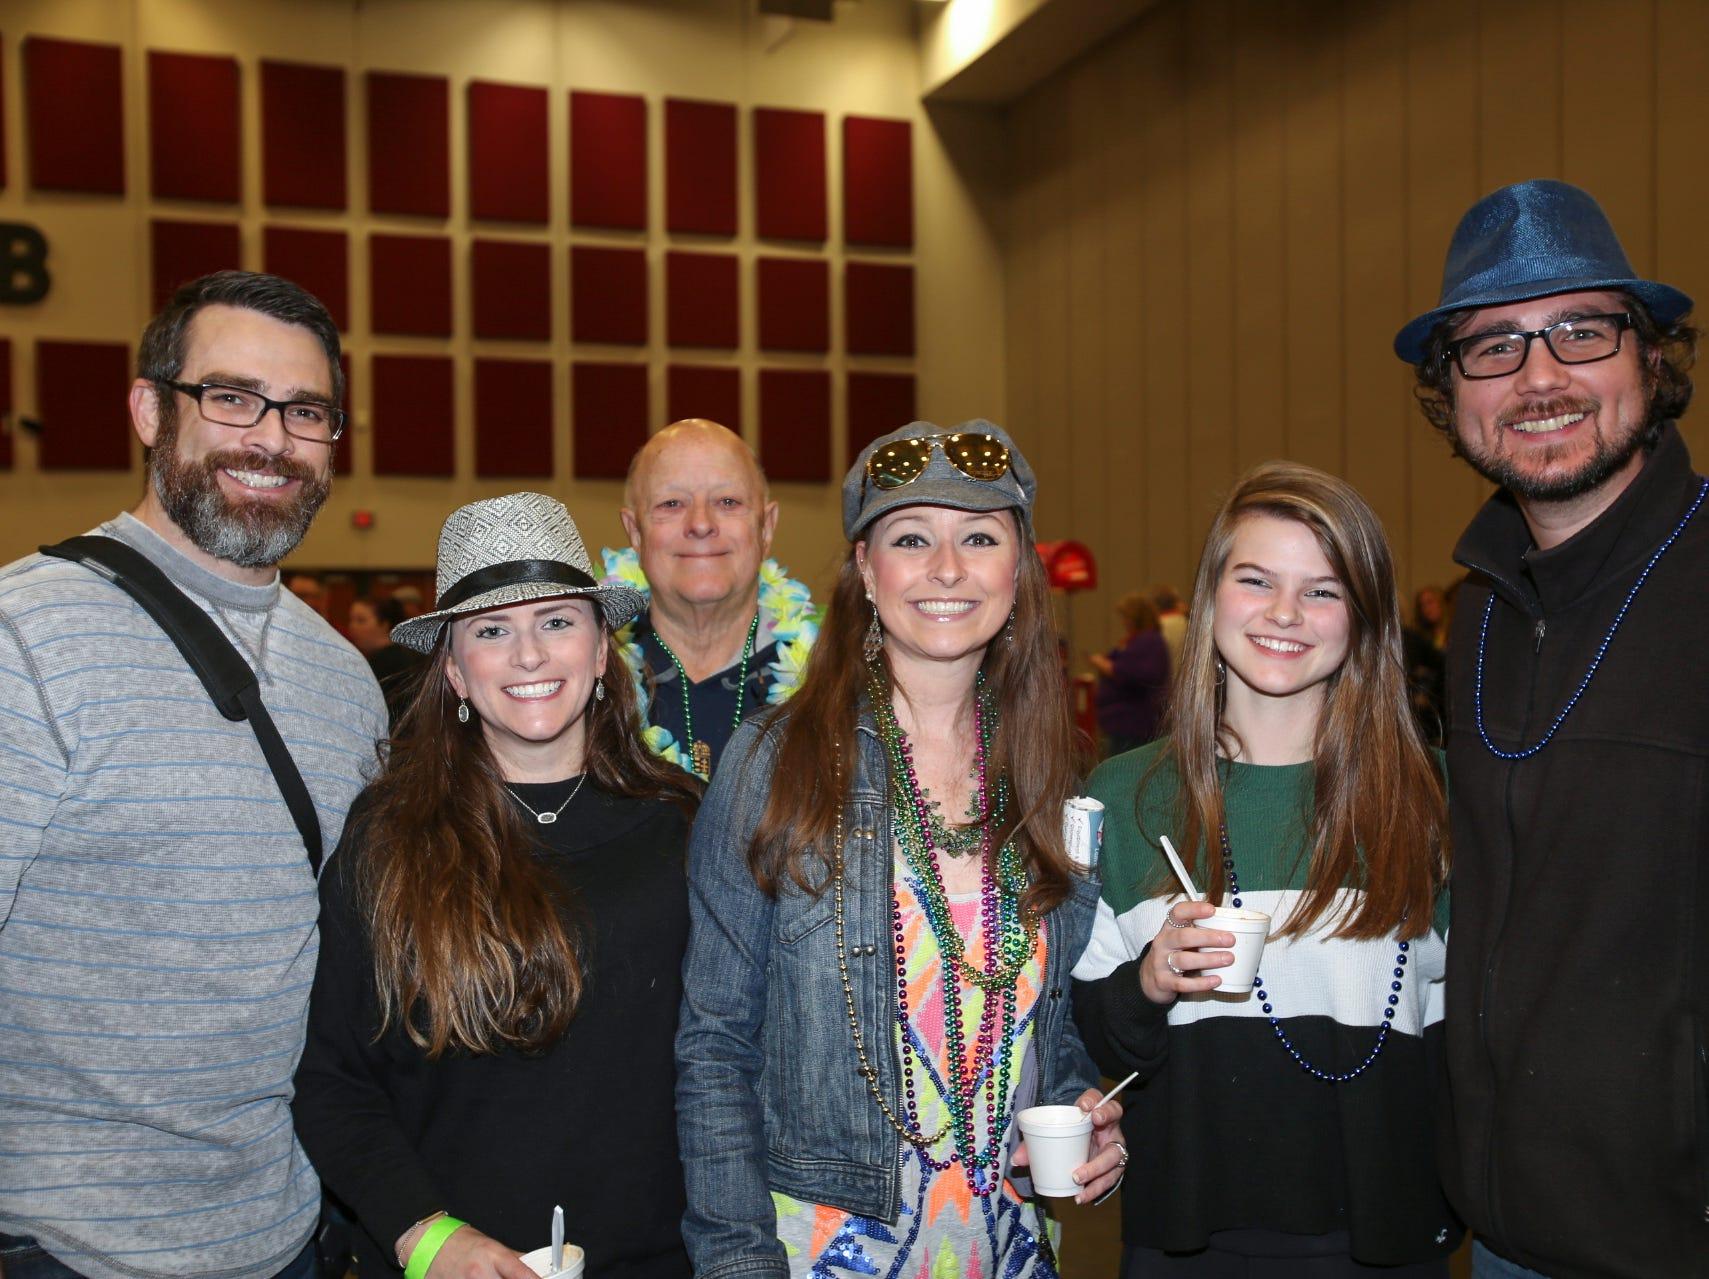 Chris, Natalie, and Bella Miller, David Staudt, Nicole Rogers, and Stephen Perkins